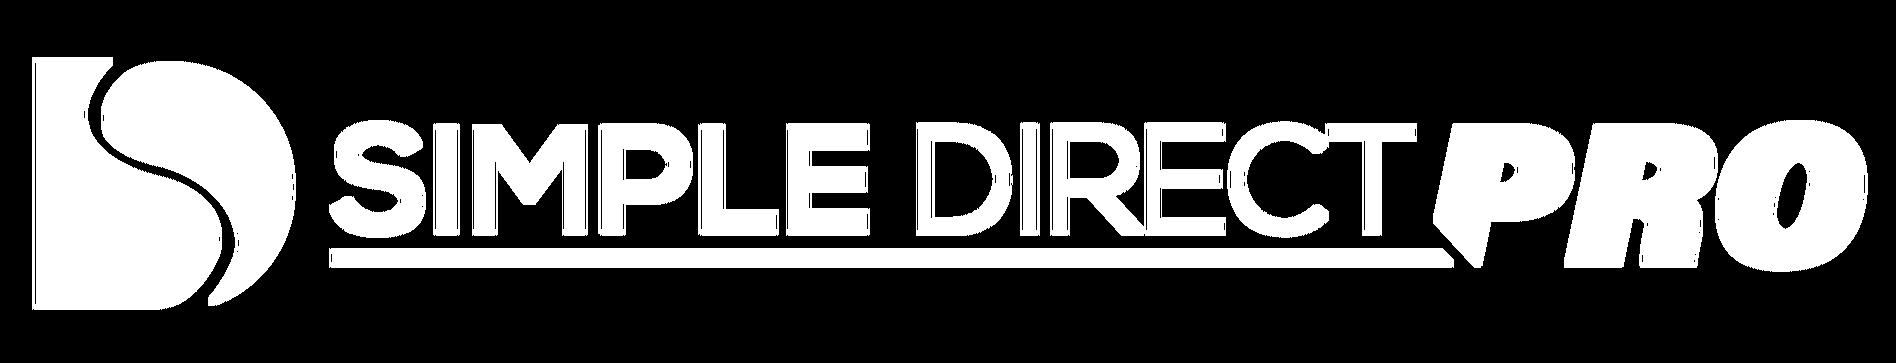 SimpleDirect Pro